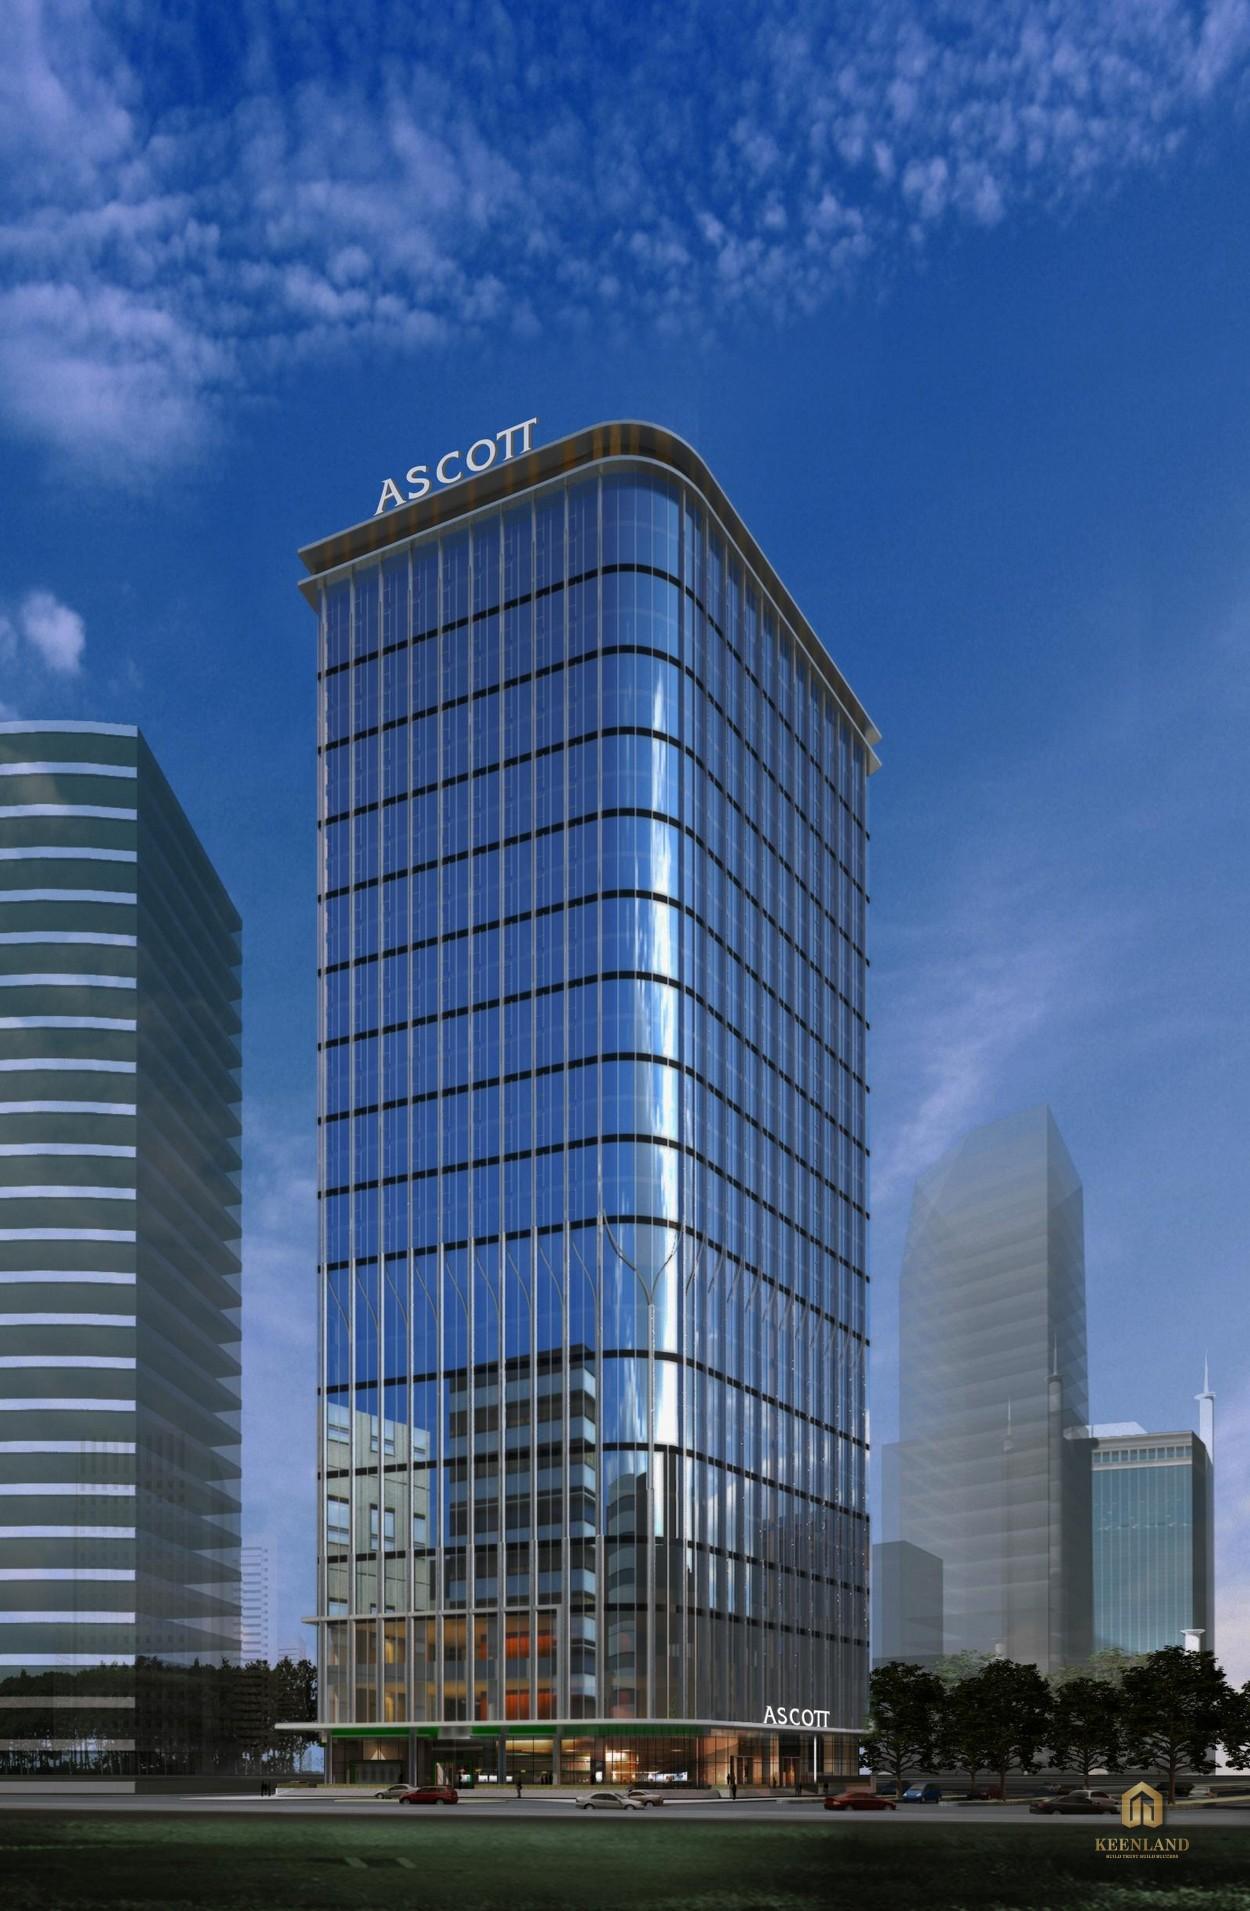 Mặt bằng tổng thể dự án Ascott Waterfront Saigon